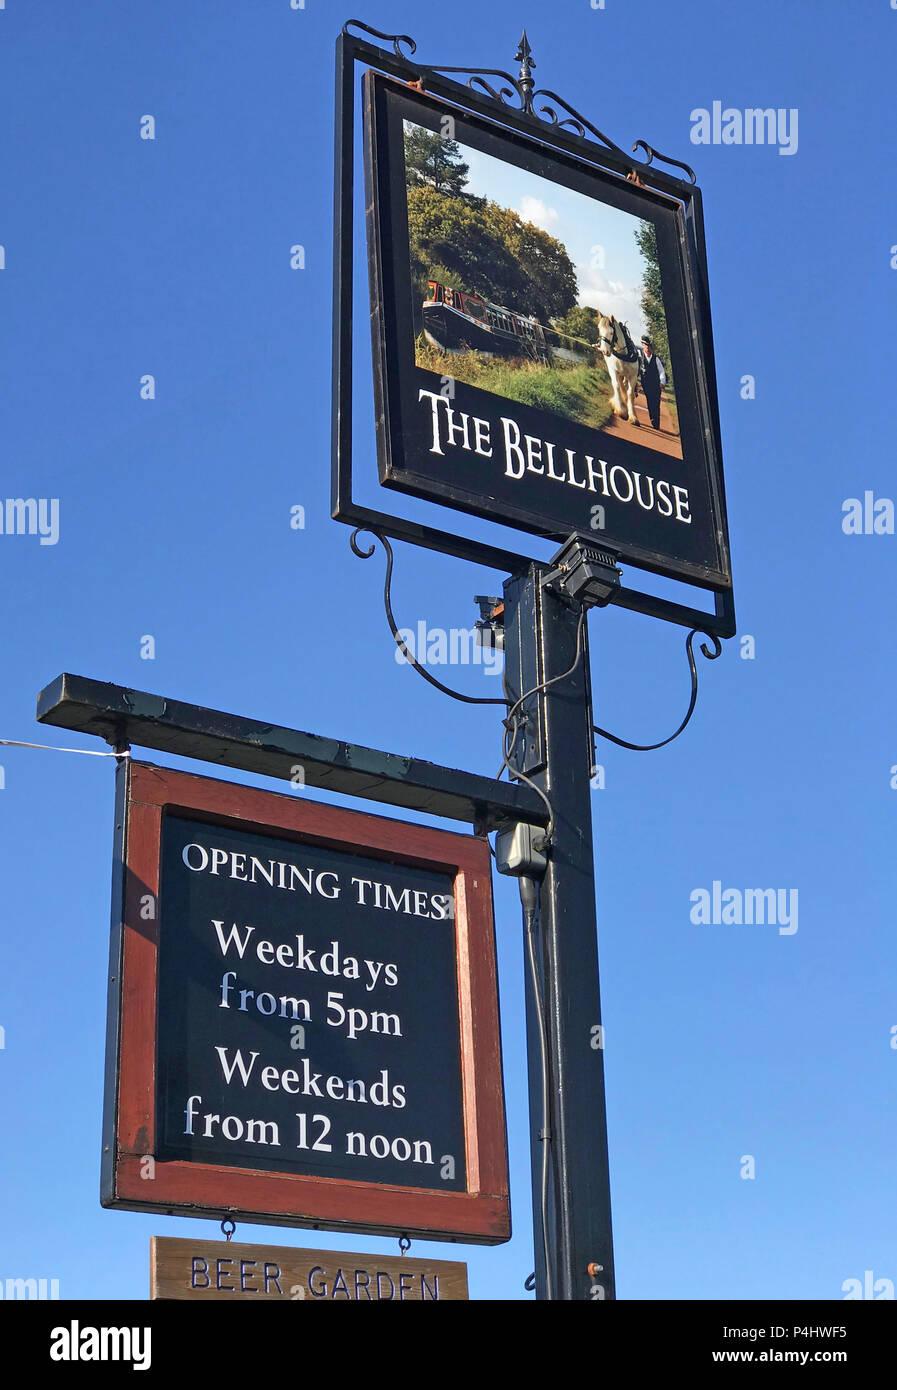 GoTonySmith,@HotpixUK,HotpixUK,Grappenhall,Village,Cheshire,Warrington,South Warrington,club,pub,realale,real ale,sign,pub sign